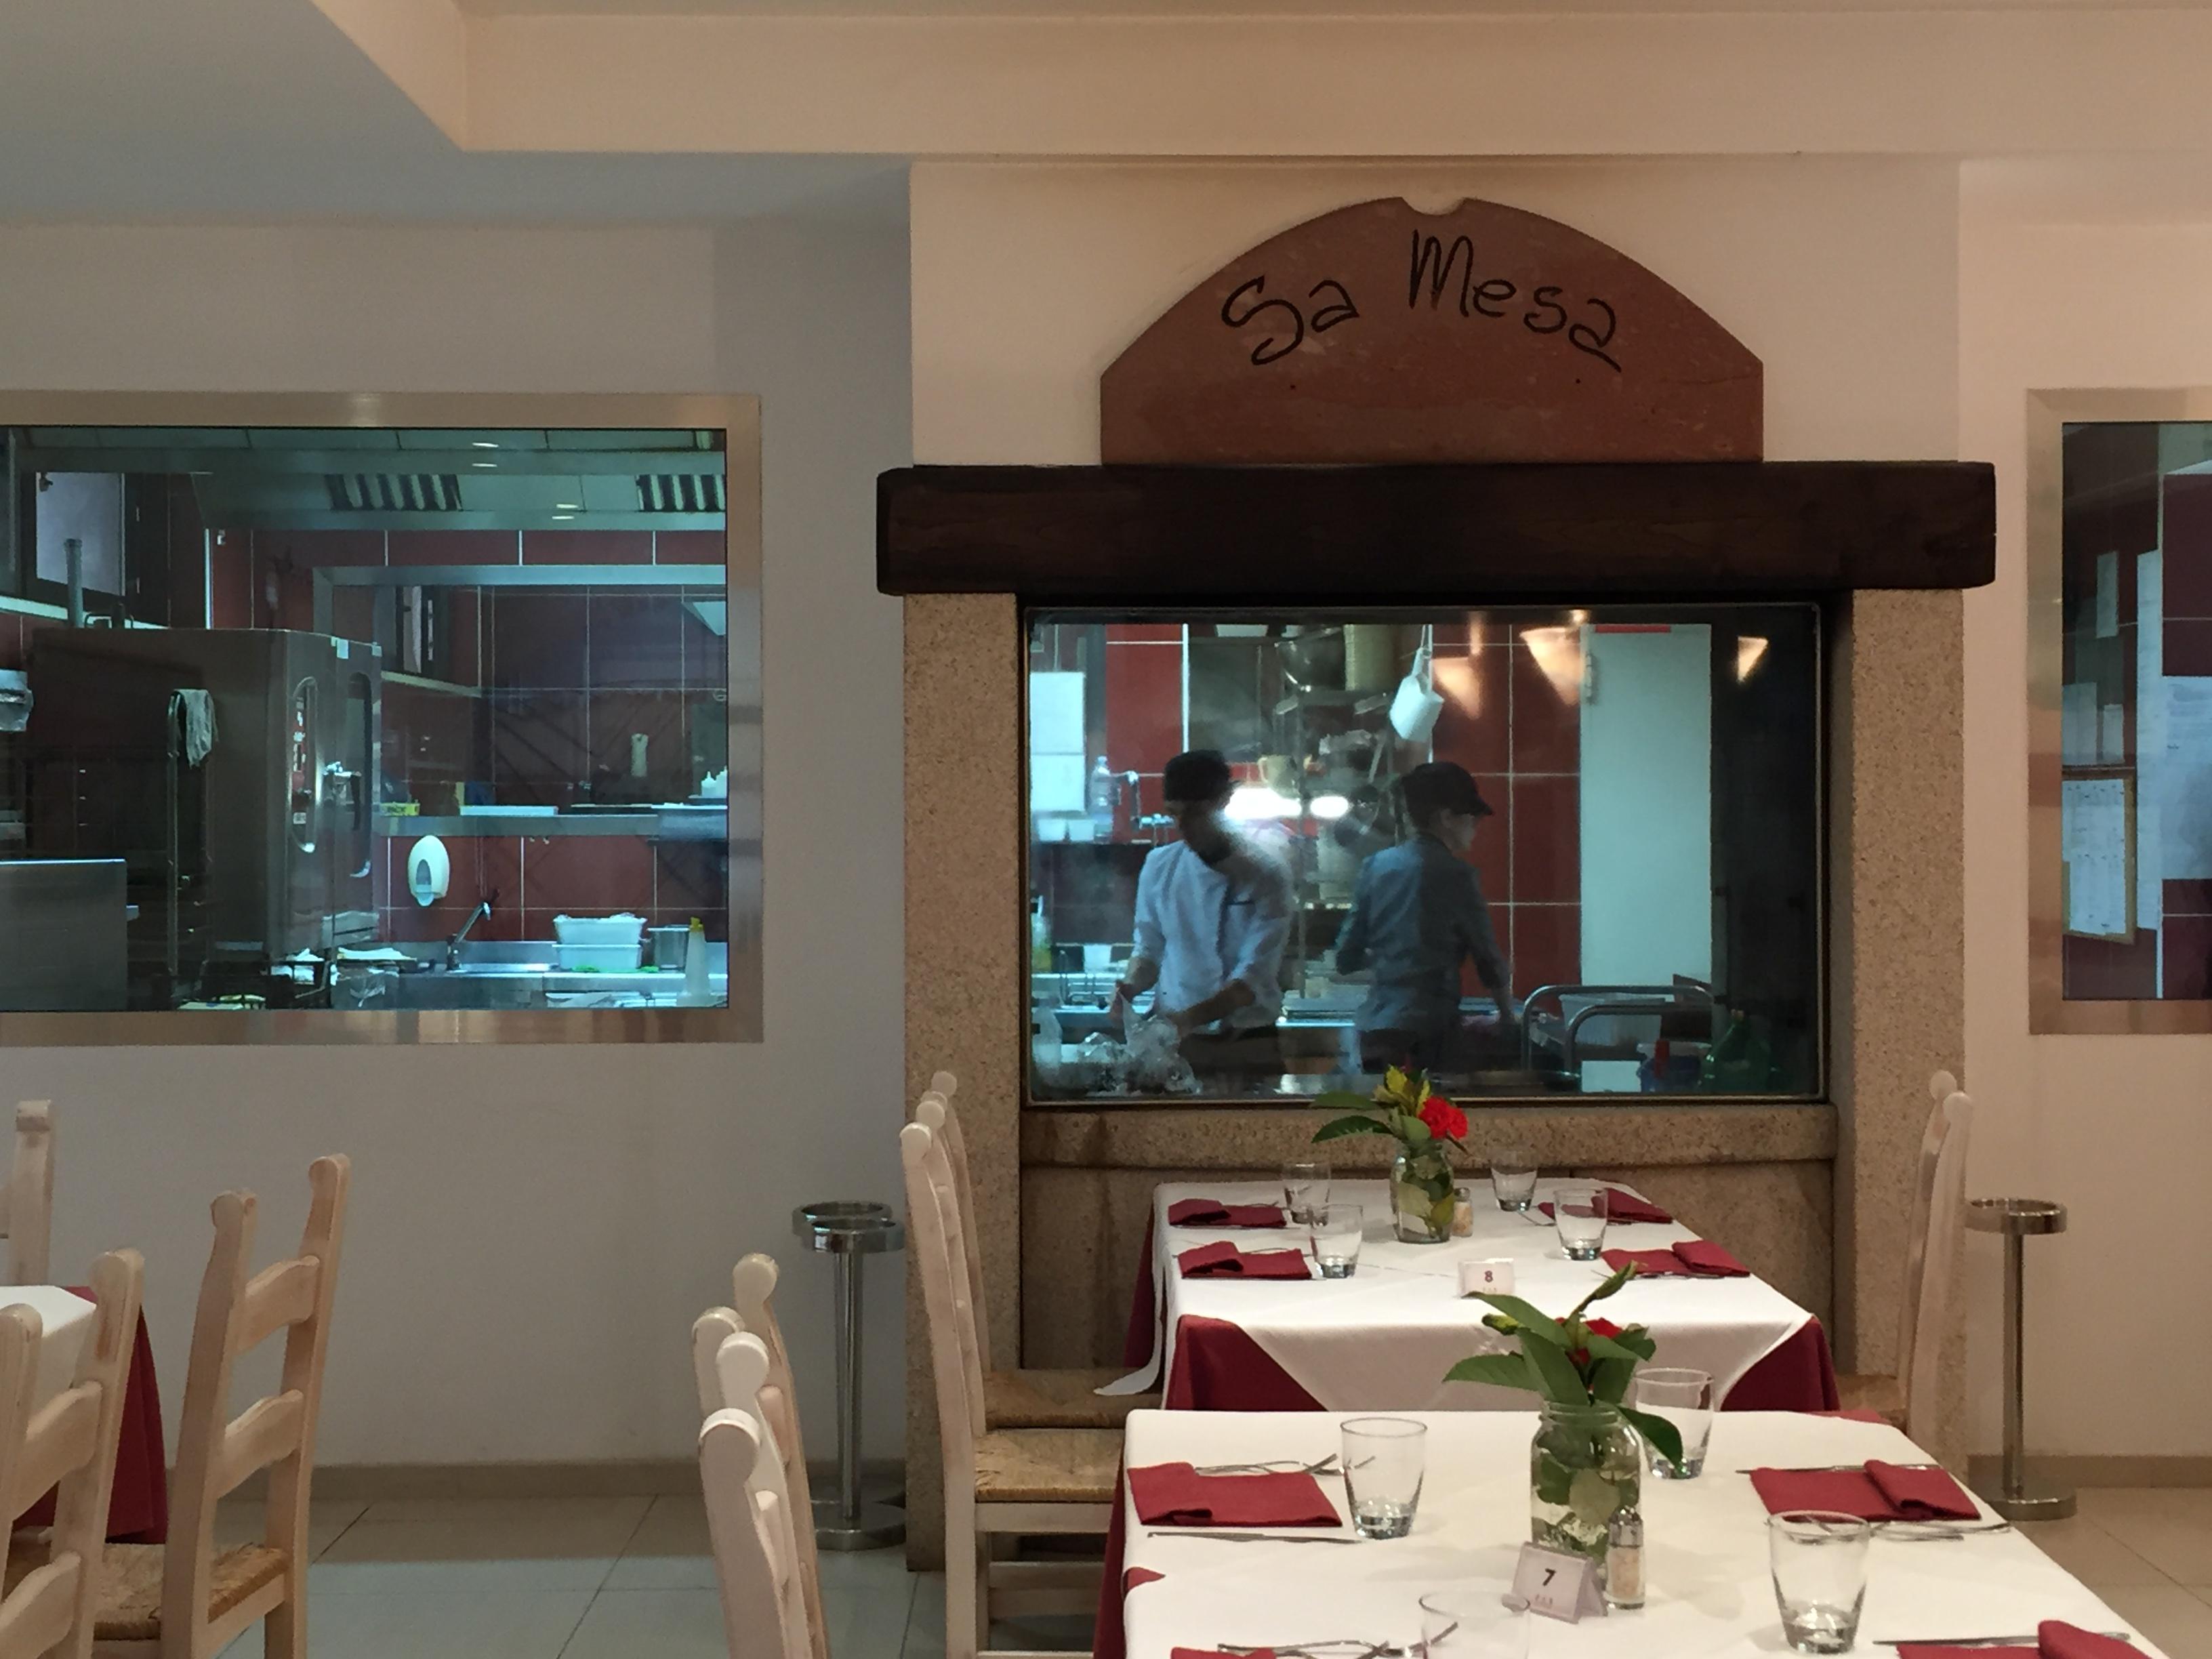 SaMesa restaurant in Geo Village is open all-year round | Olbia, Sardinia | BrowsingItaly.com